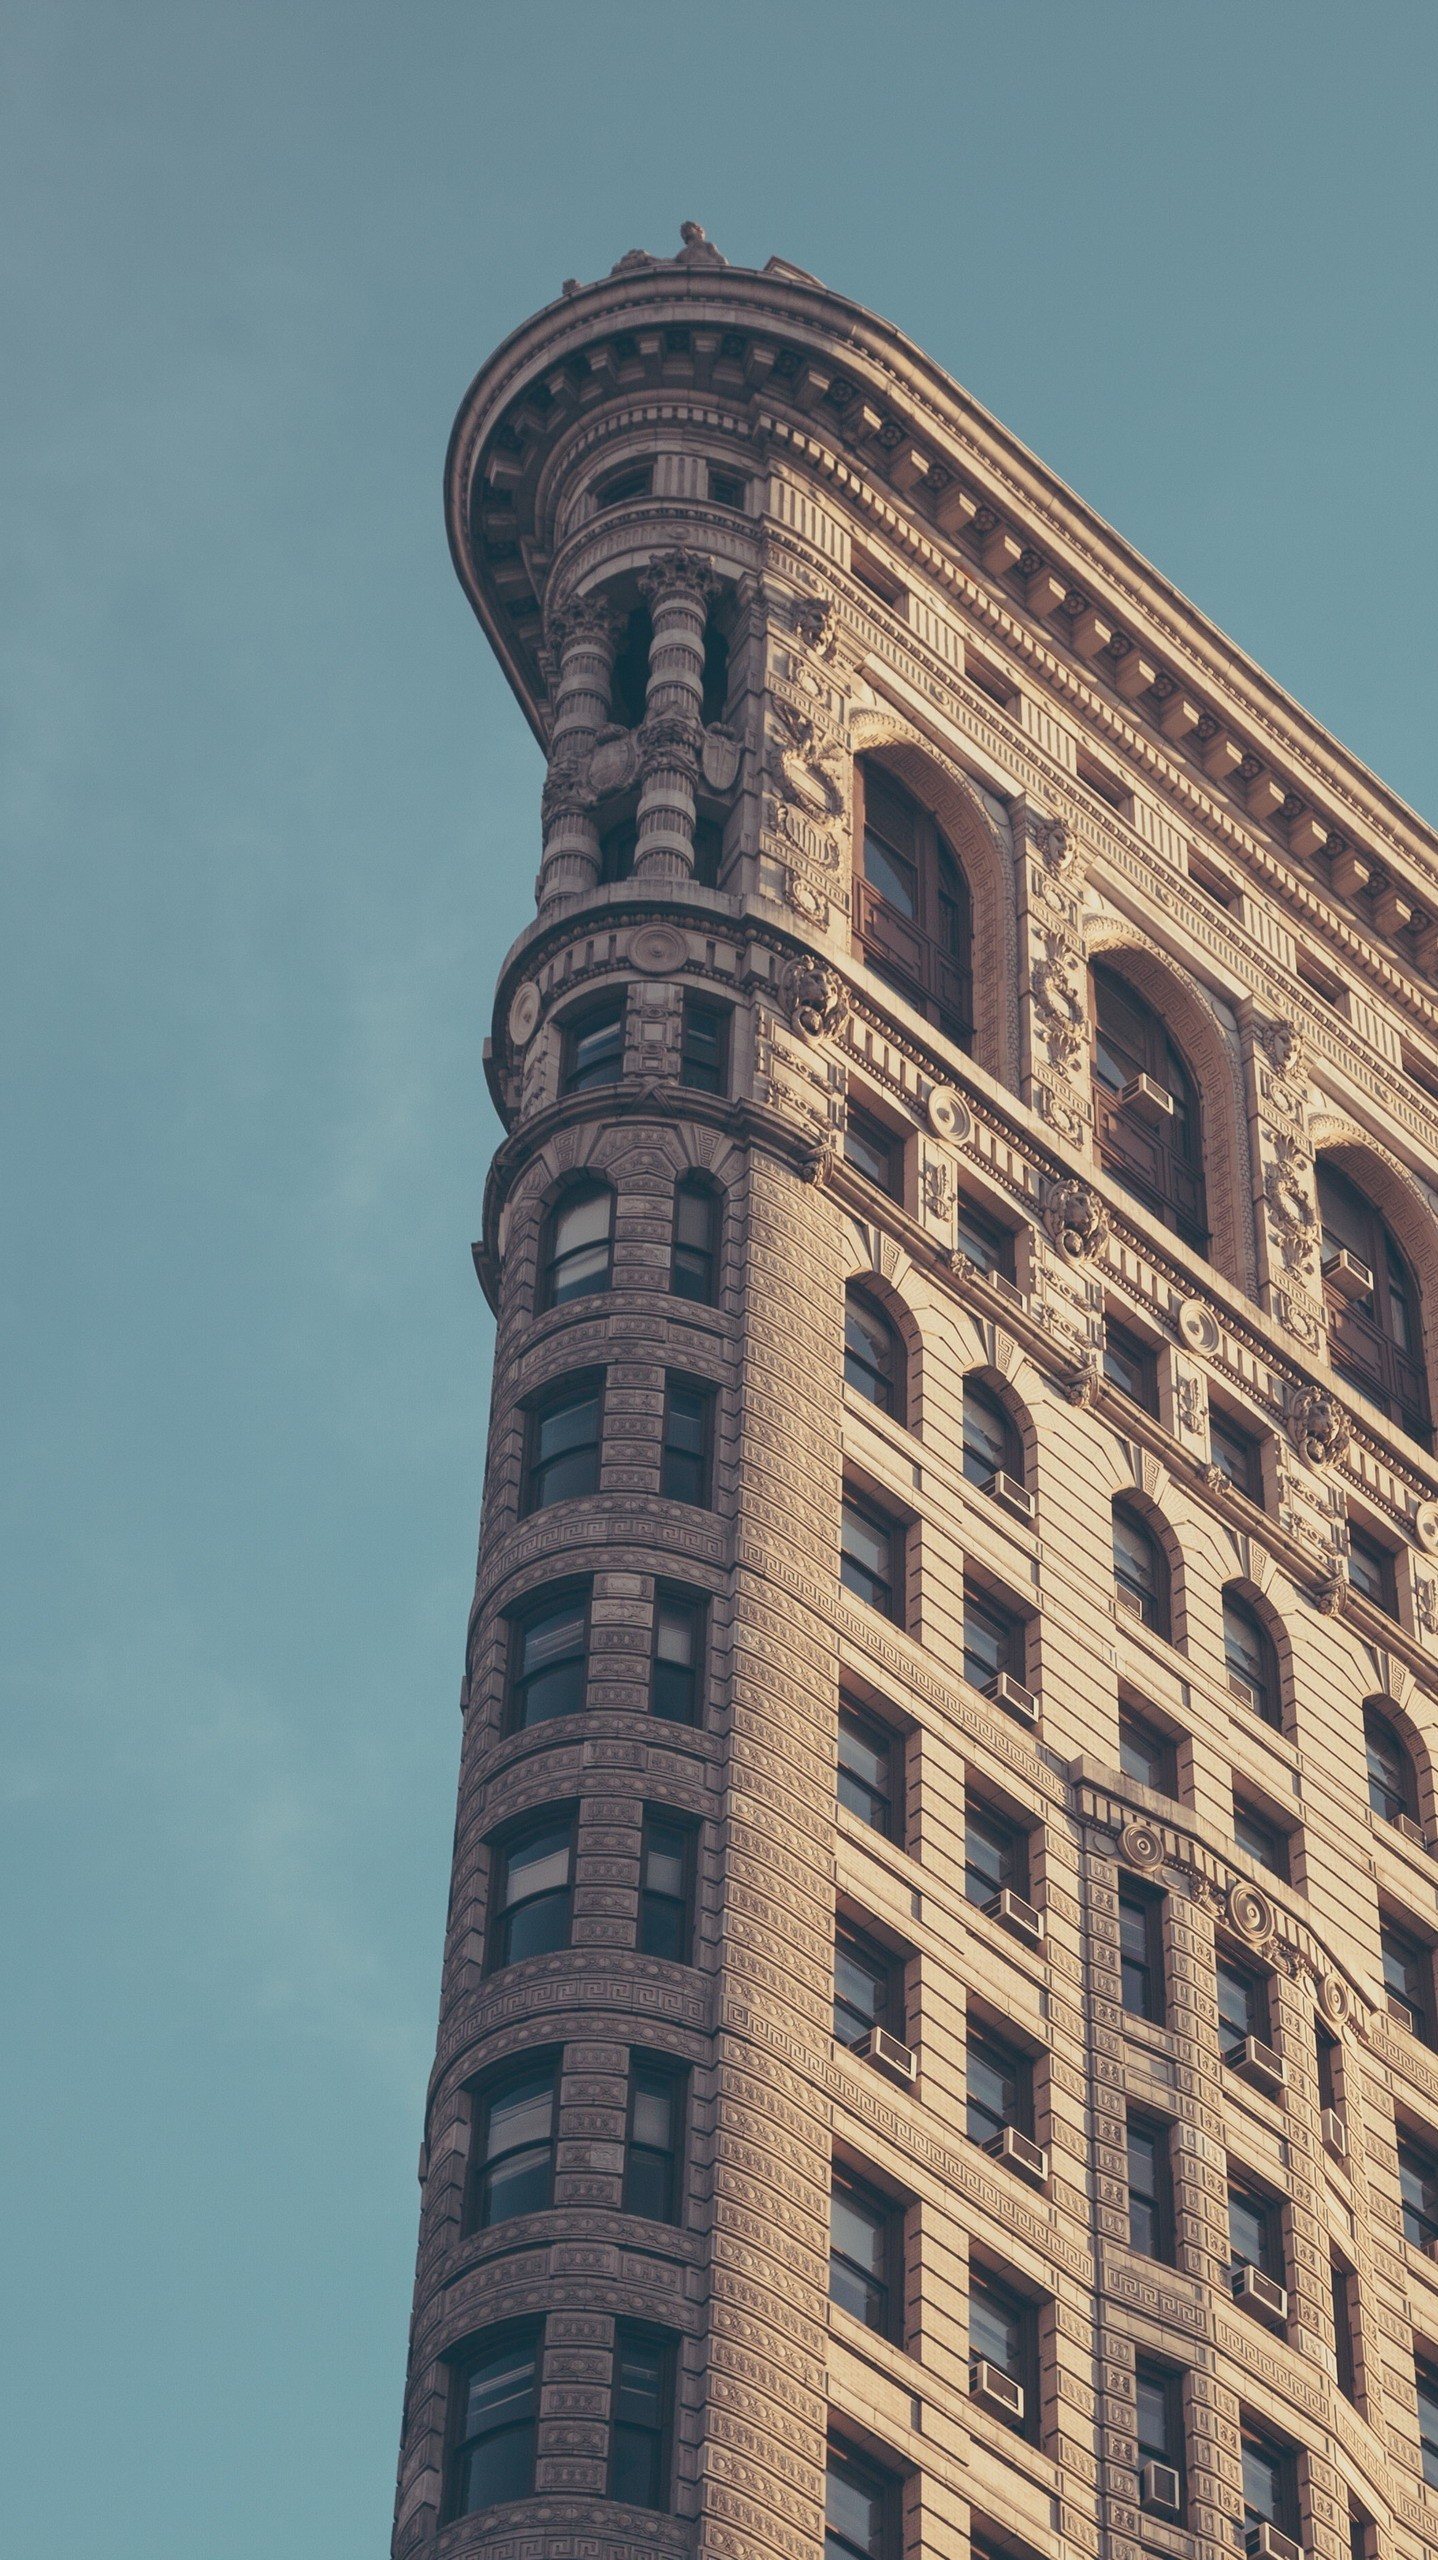 Flatiron-Building-New-York-City-Minimal-iPhone-Wallpaper – iPhone Wallpapers